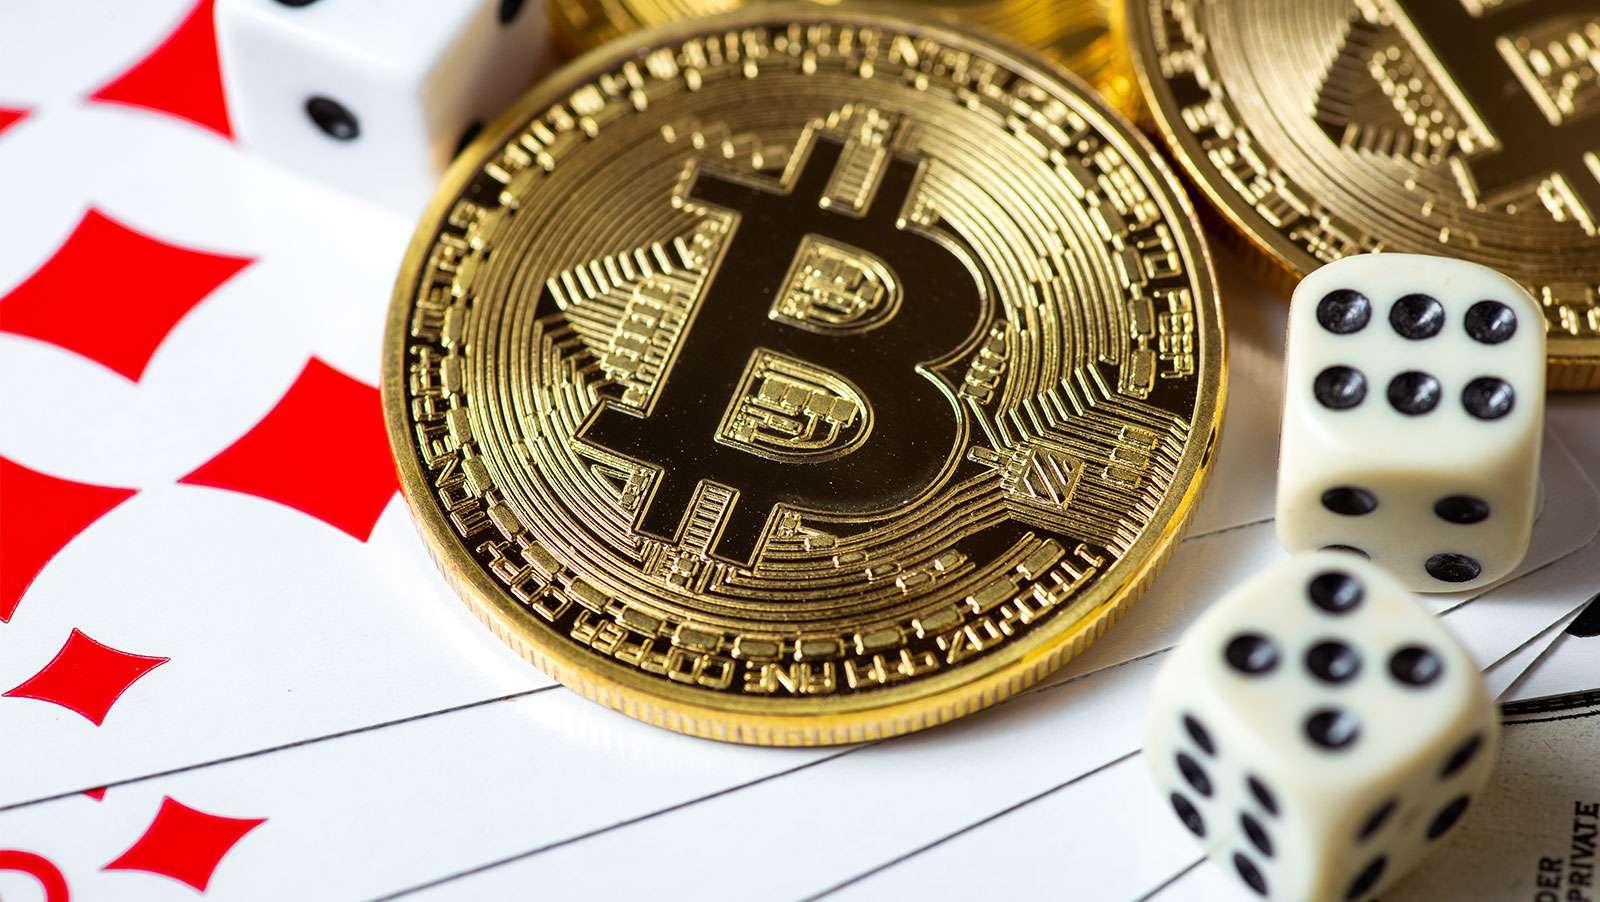 BDO Malta CEO Mark Attard: Blockchain, gambling destined for each other